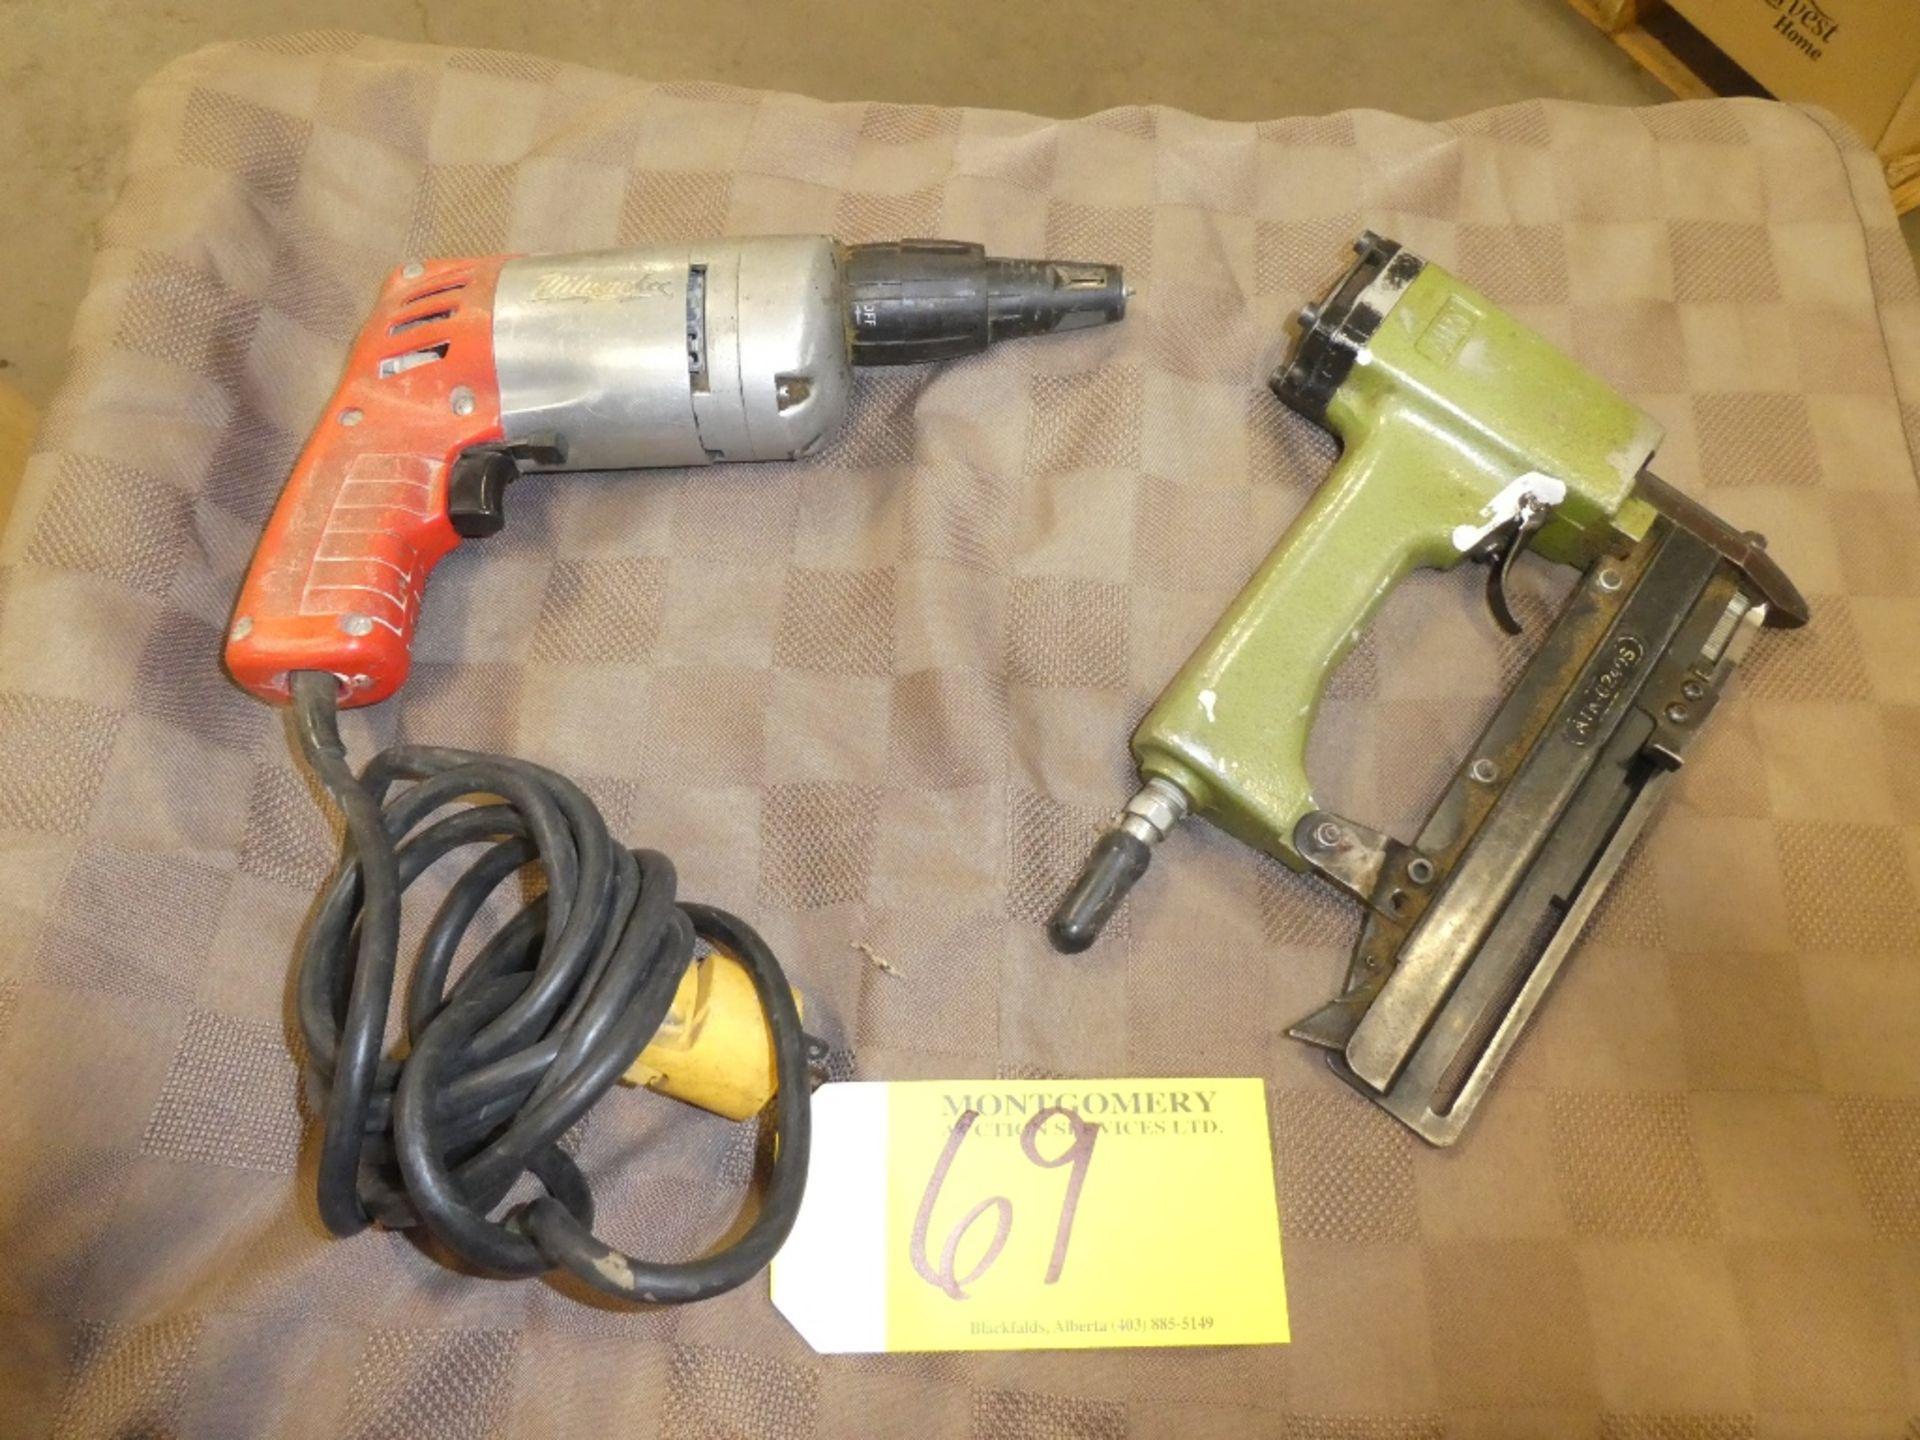 Lot 69 - MILWAUKEE ELECTRIC DRYWALL GUN AIRY AIR STAPLER